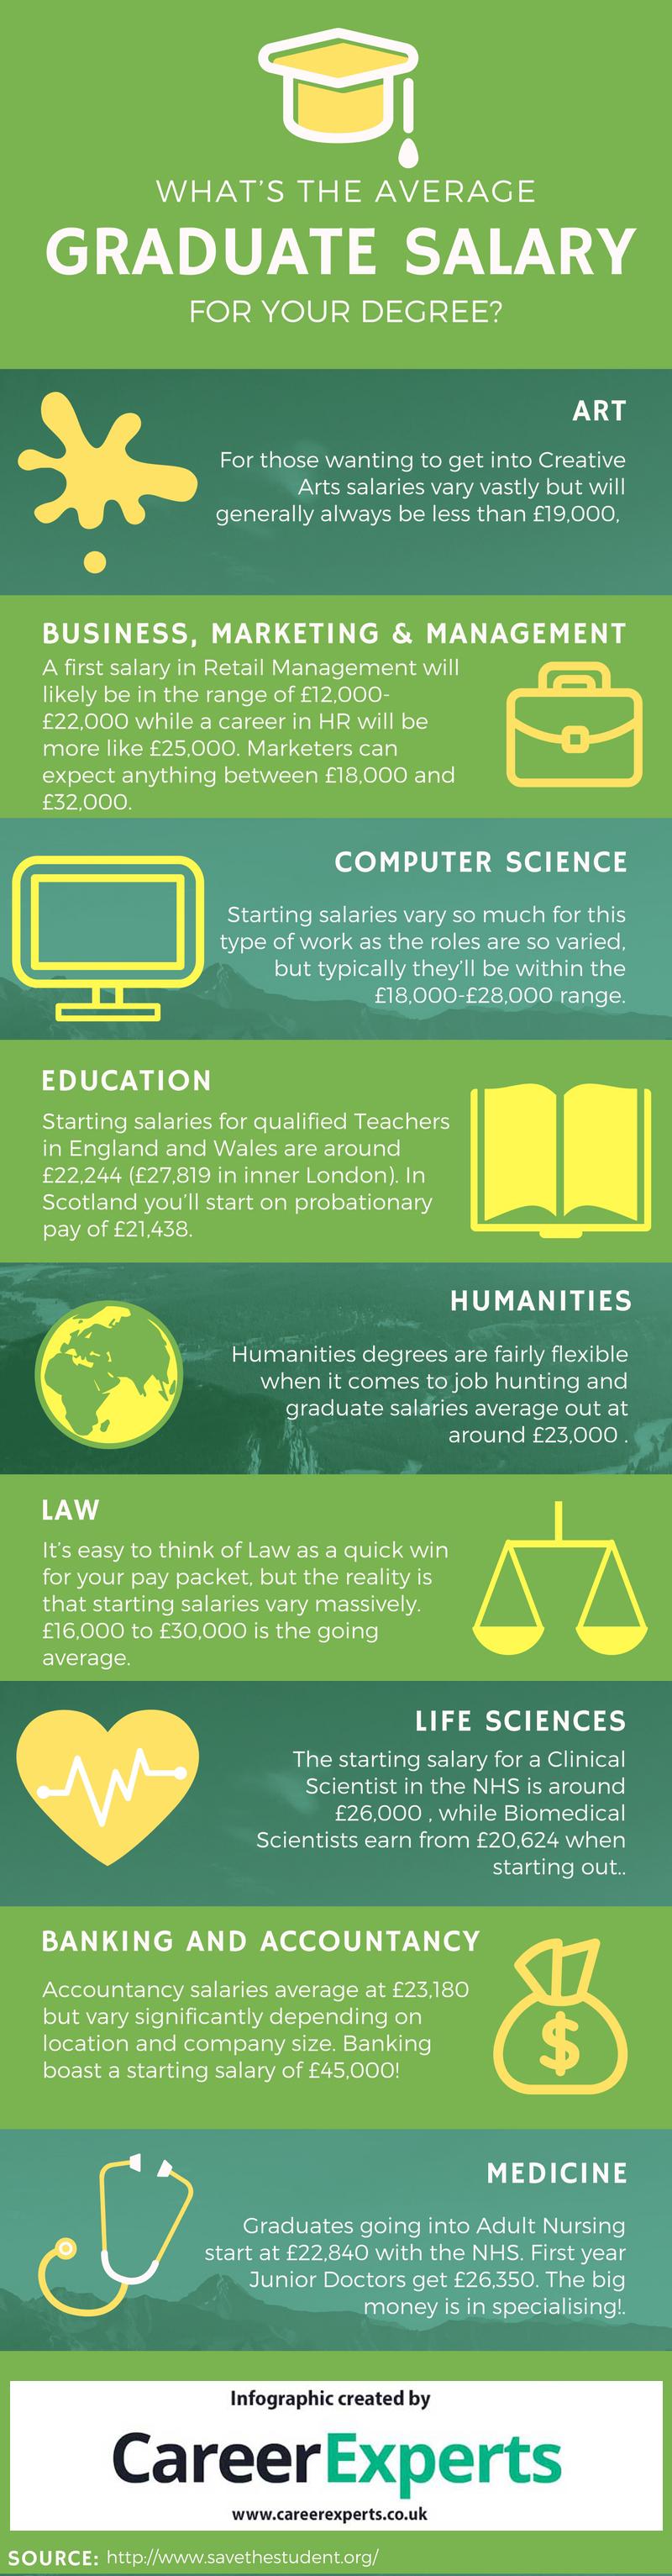 Average graduate salary for degree